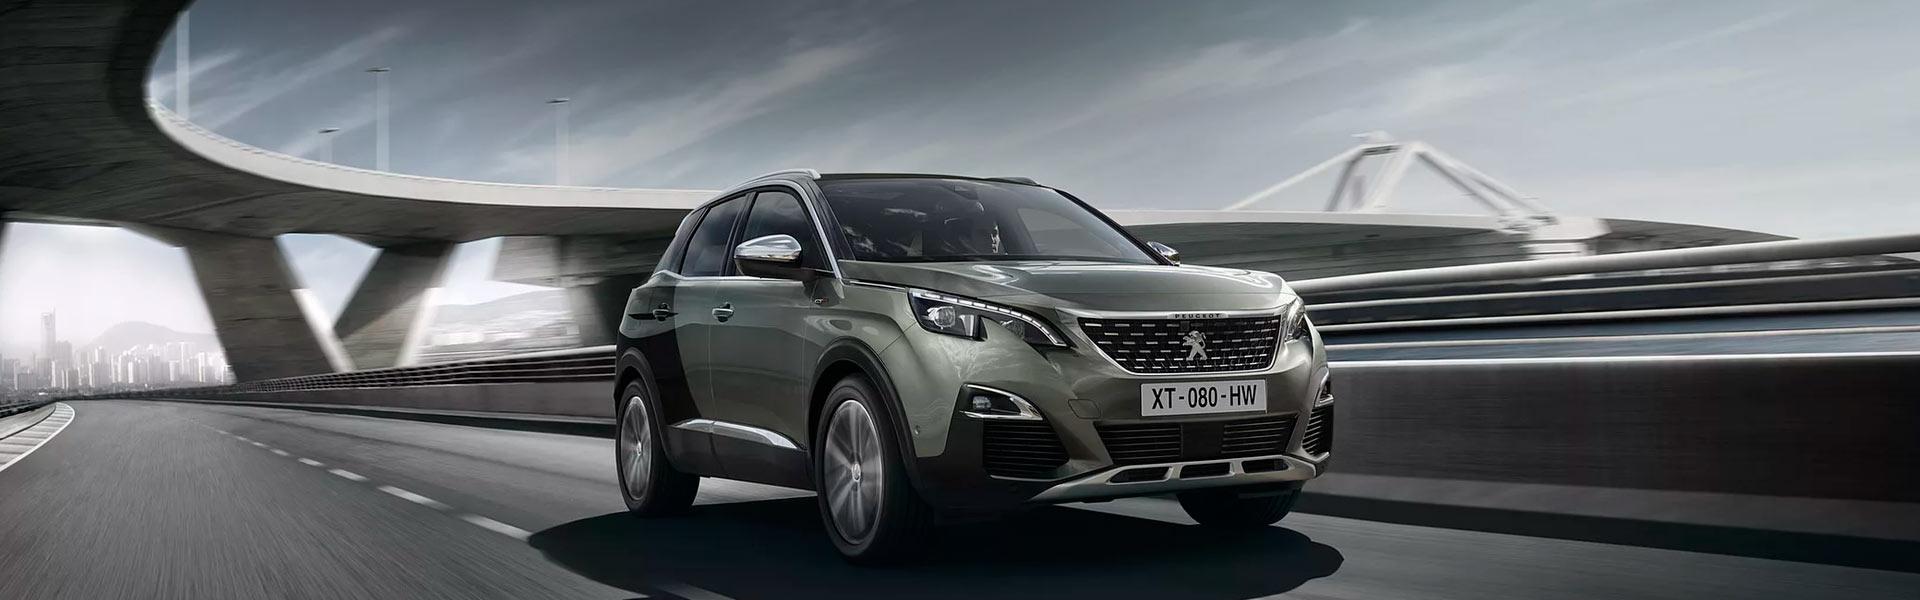 Сцепление на Peugeot